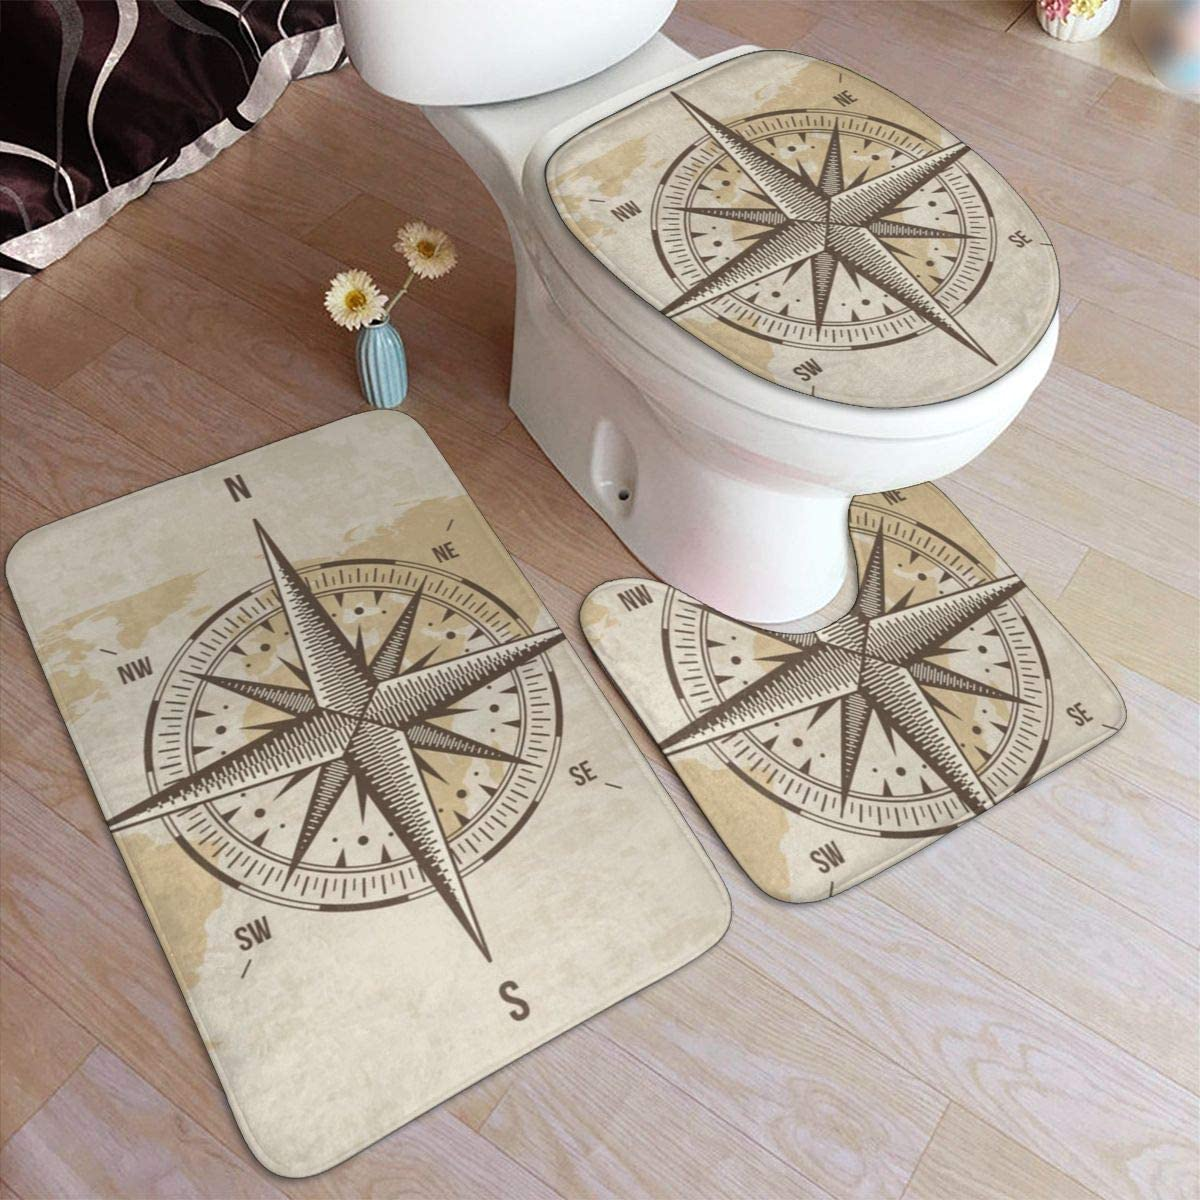 Nautical Compass Old World Map 3 Piece Bathroom Rug Set, Anti-Skid Pads Bath Mat + Contour + Toilet Lid Cover